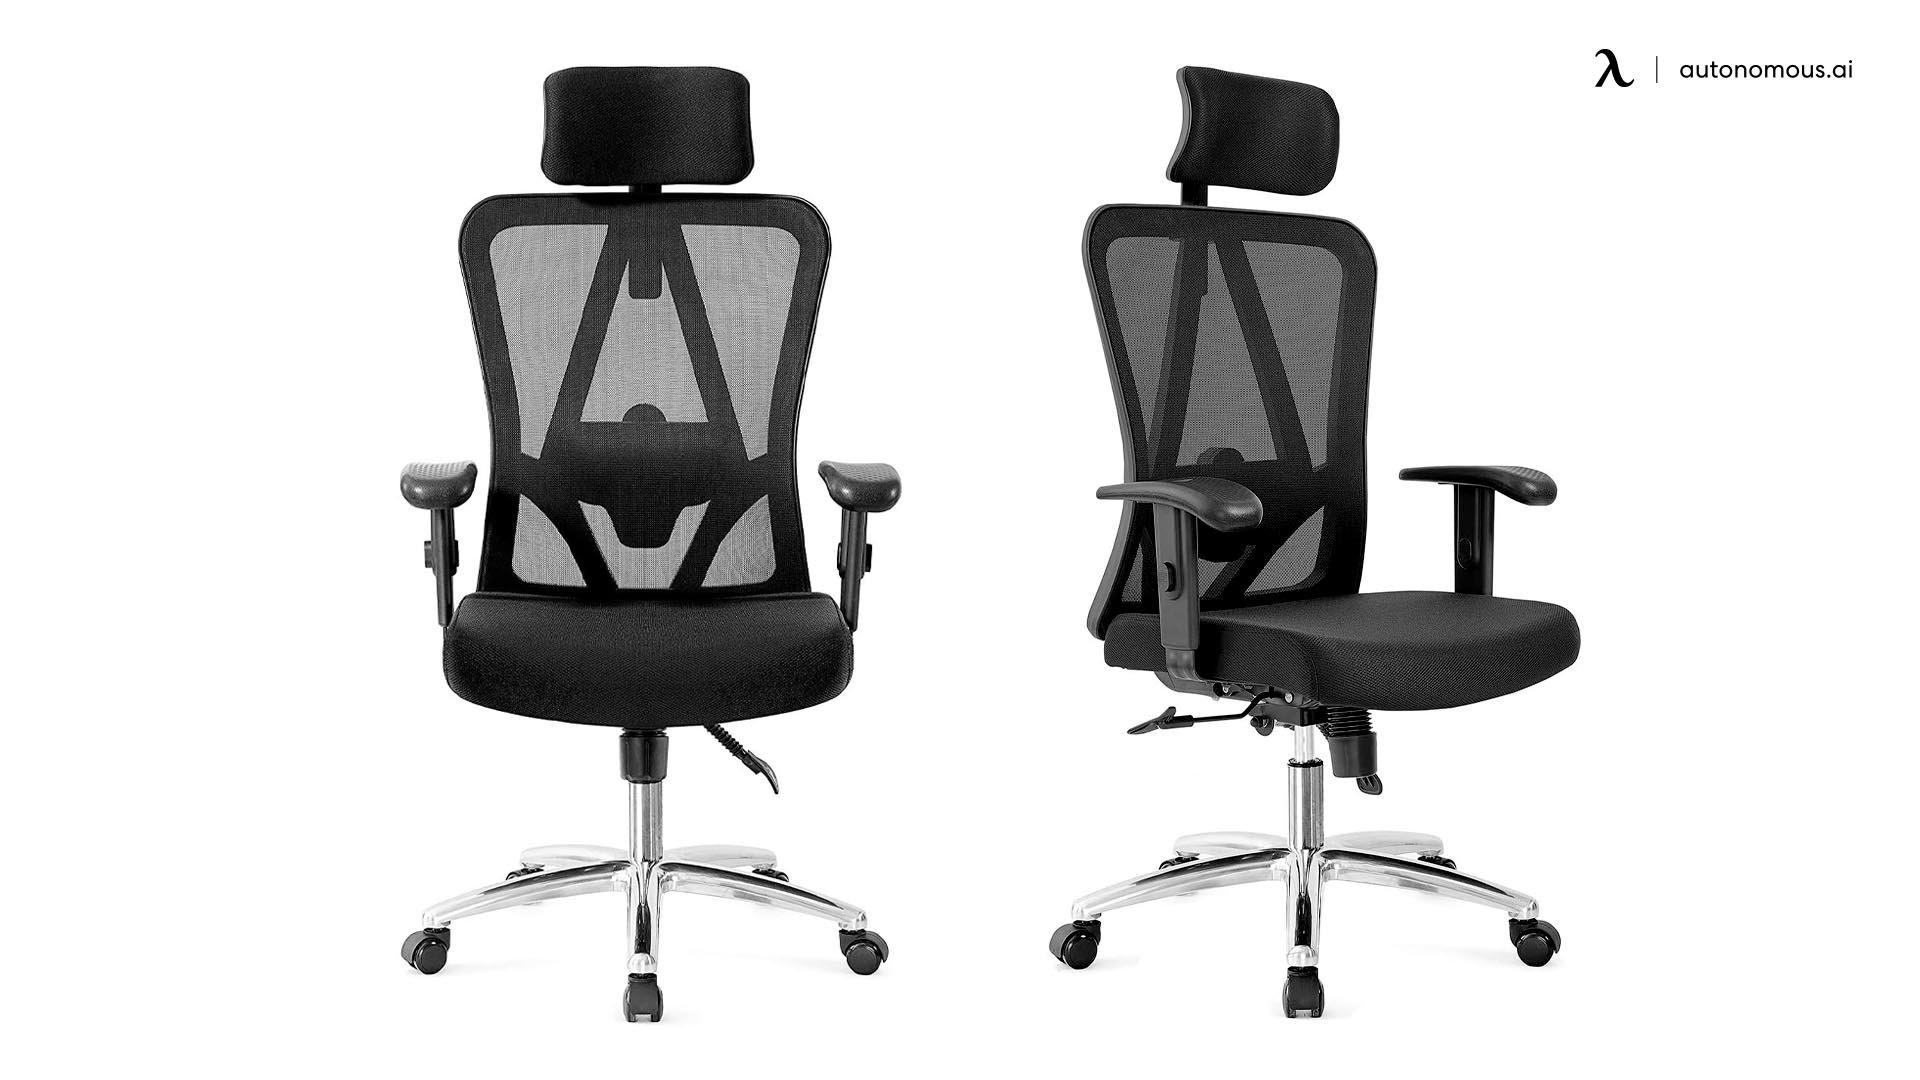 Ergonomic Office Chair by Ticova